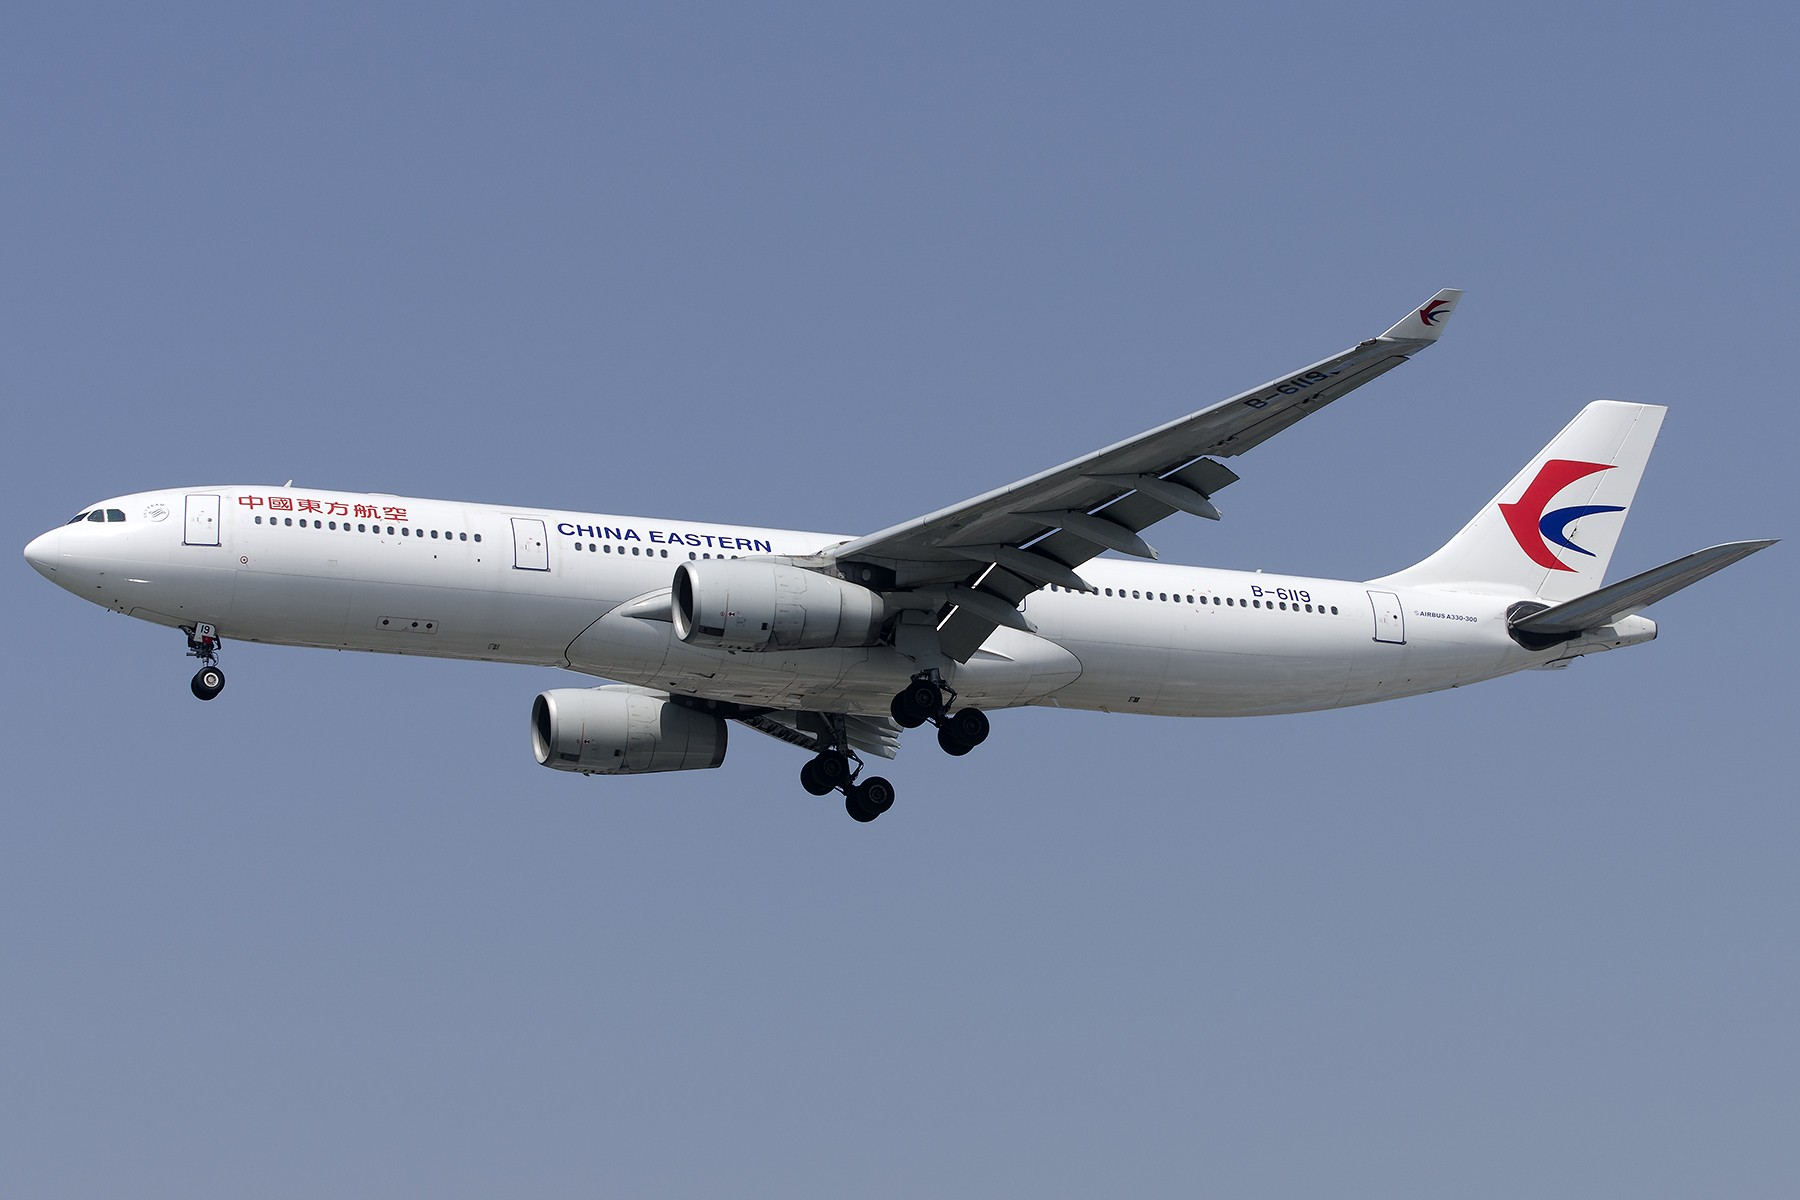 Re:[原创][原创]【SHA拍机*1800大图】4月拍的了,记得那天好货还挺多 AIRBUS A330-300 B-6119 中国上海虹桥国际机场